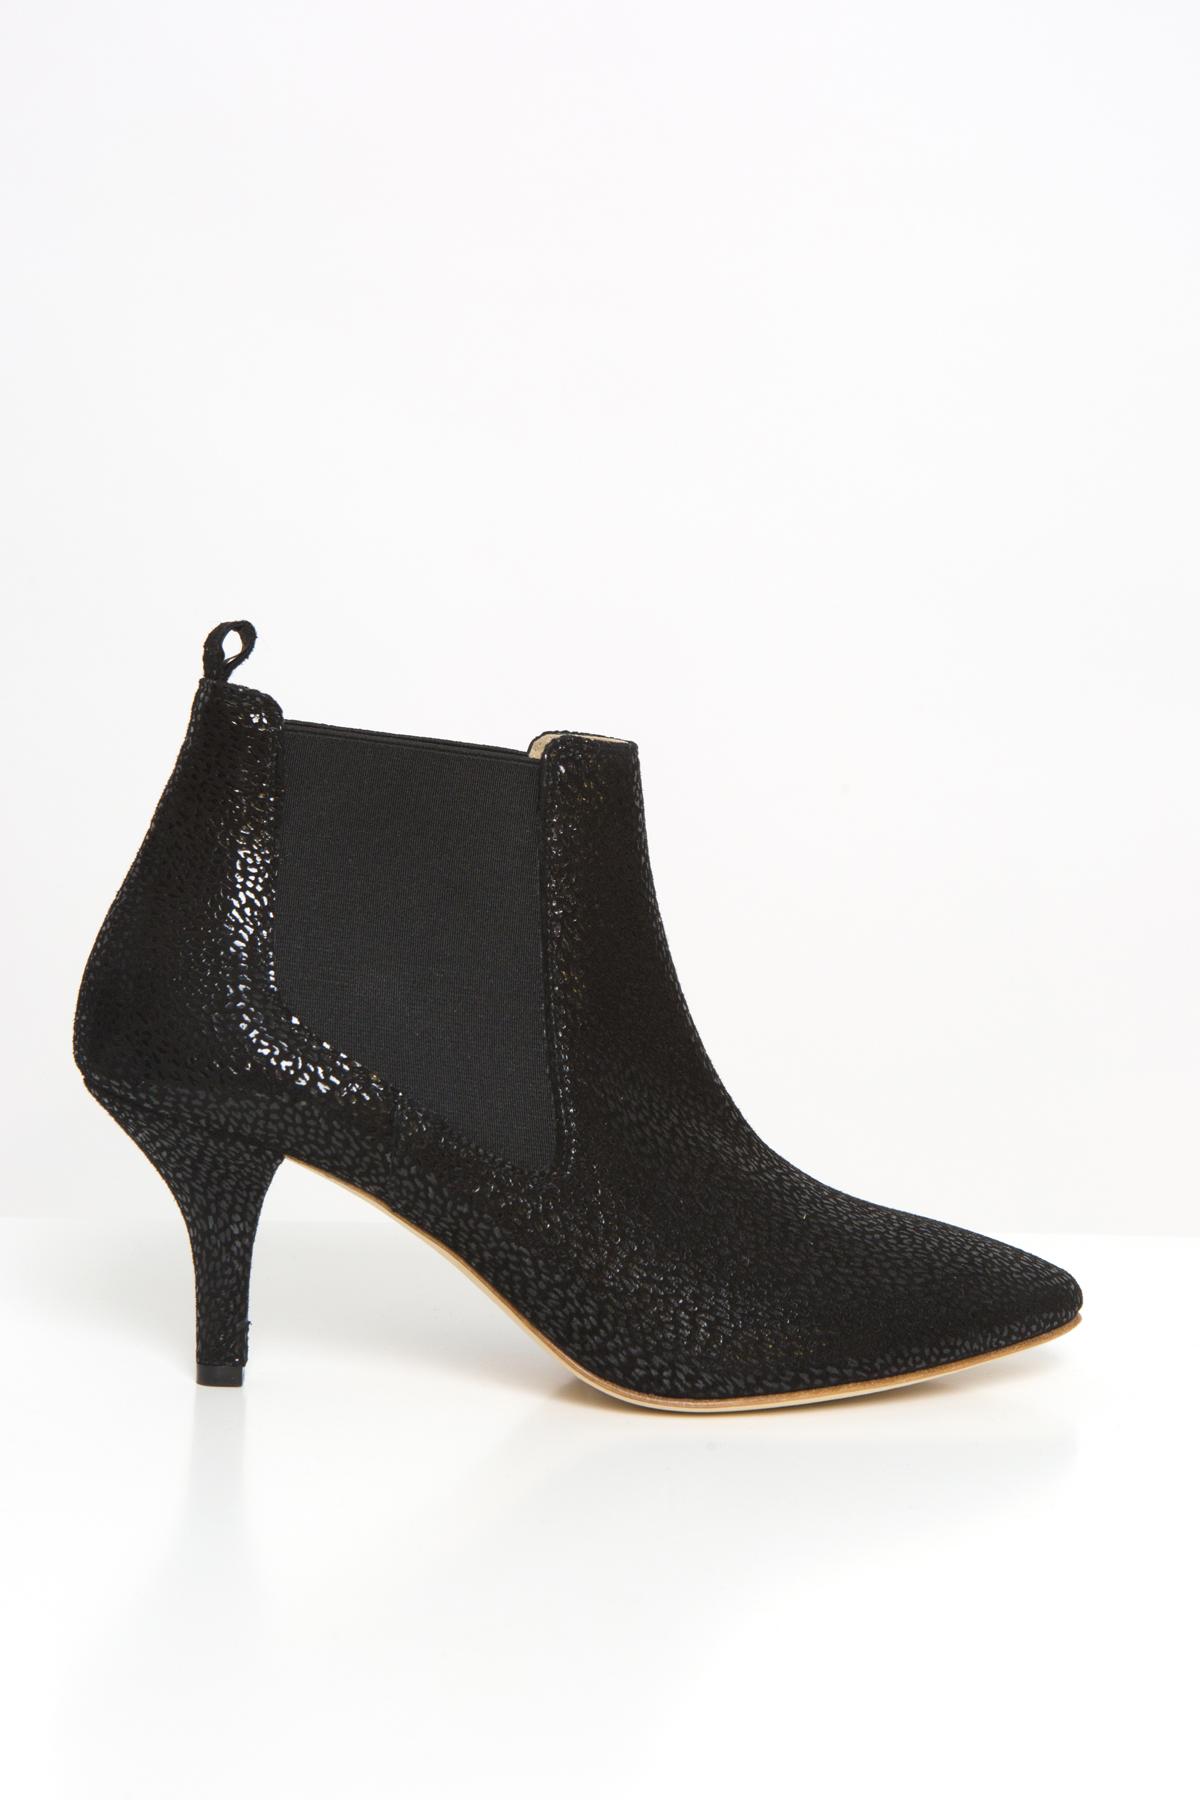 tex-cgoc-black-suede-boots-anniel-matchboxathens